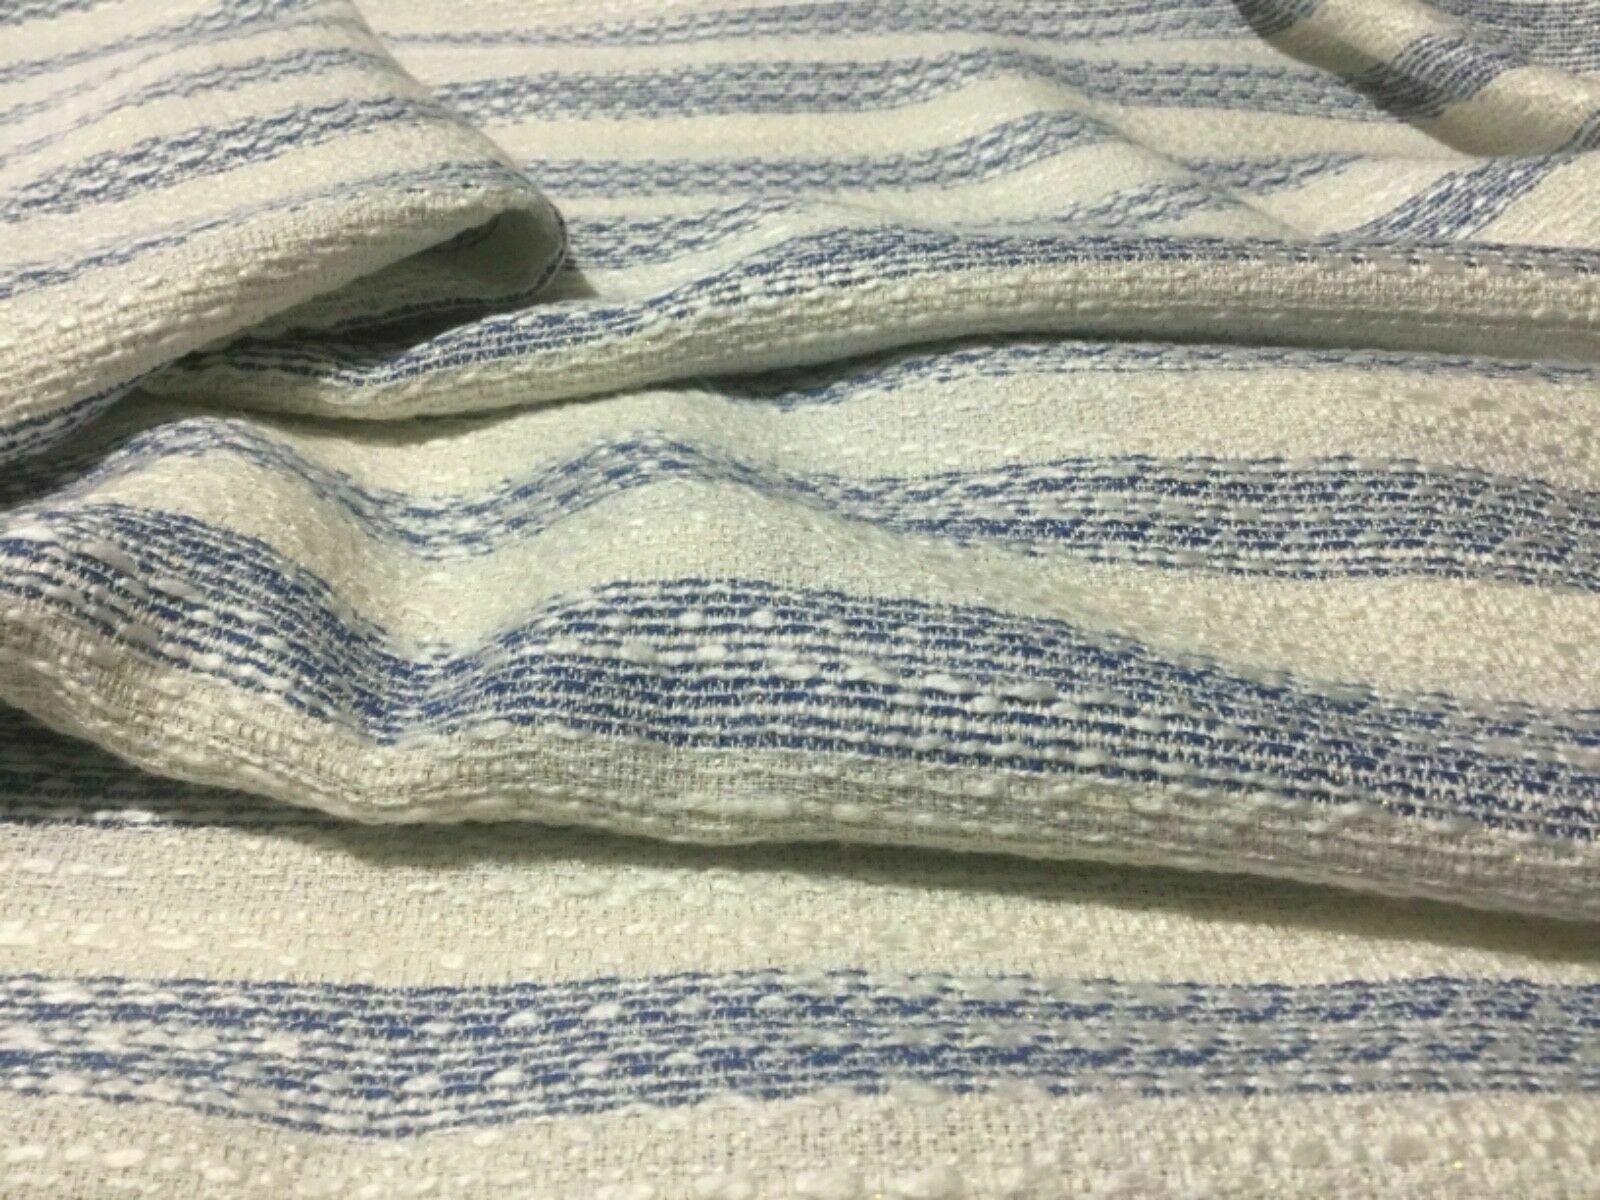 New Designer Multicolored Wool Boucle Fabric As Seen On Designer Catwalk 58''